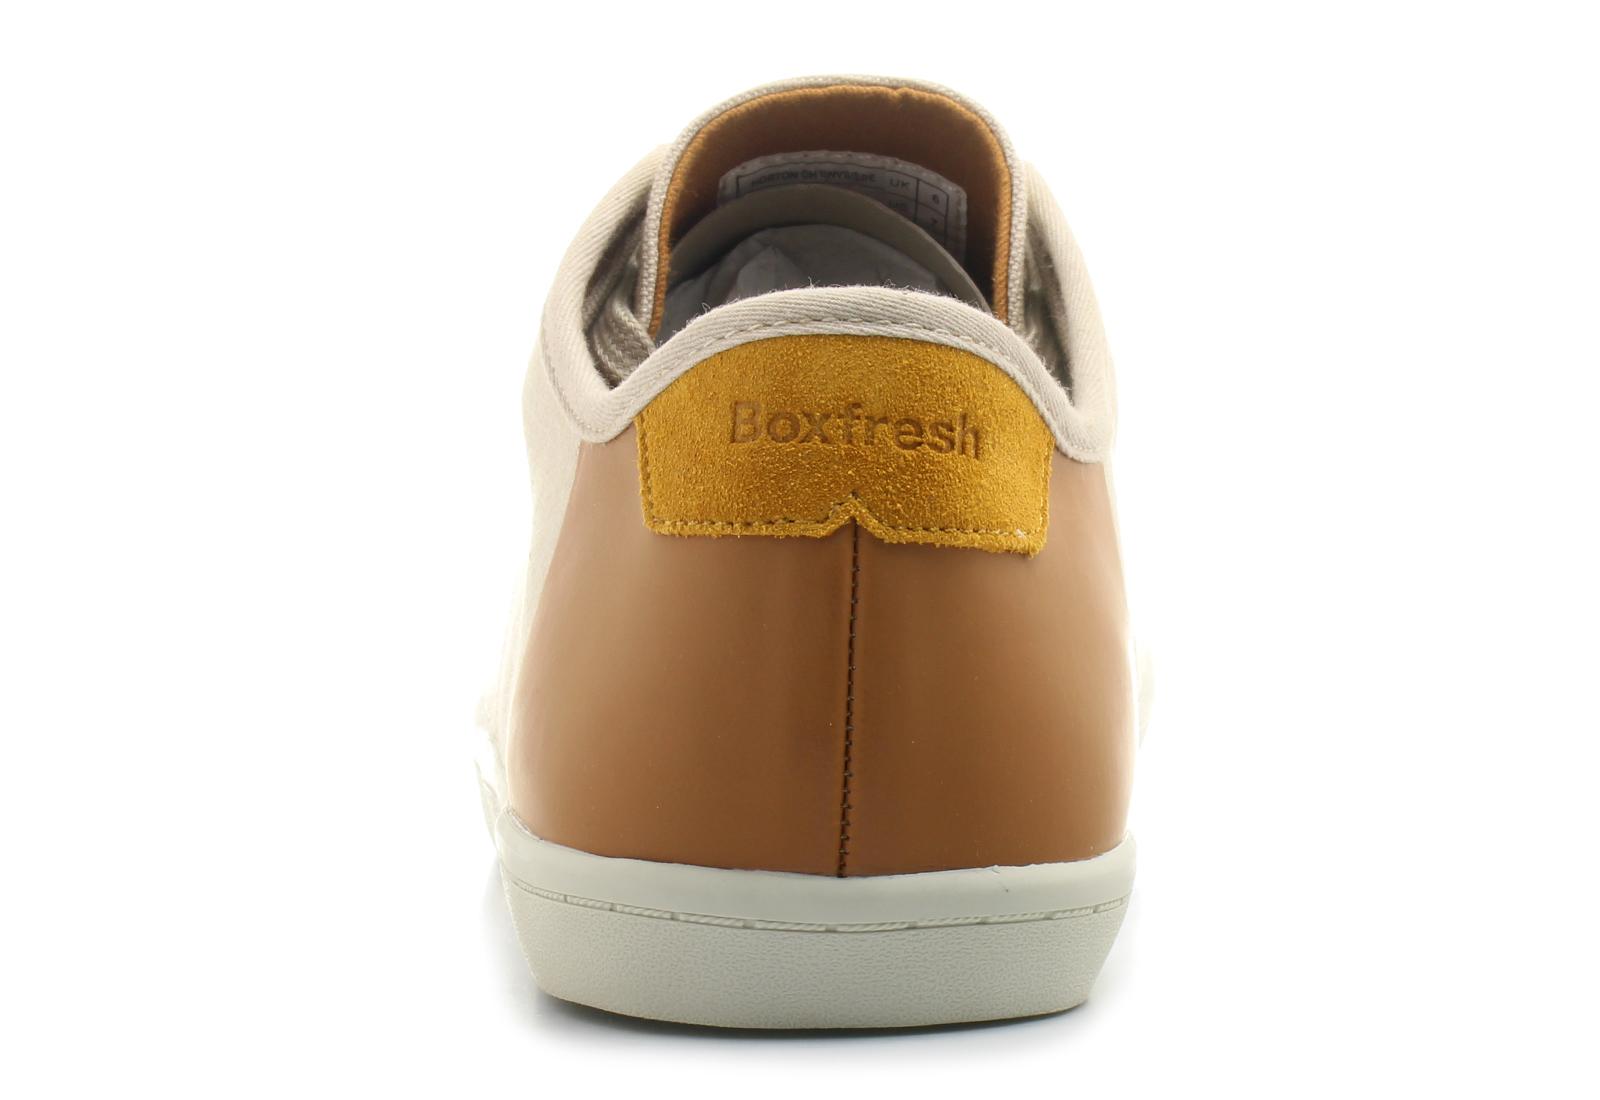 Boxfresh Shoes - Horton - E15029-dsn